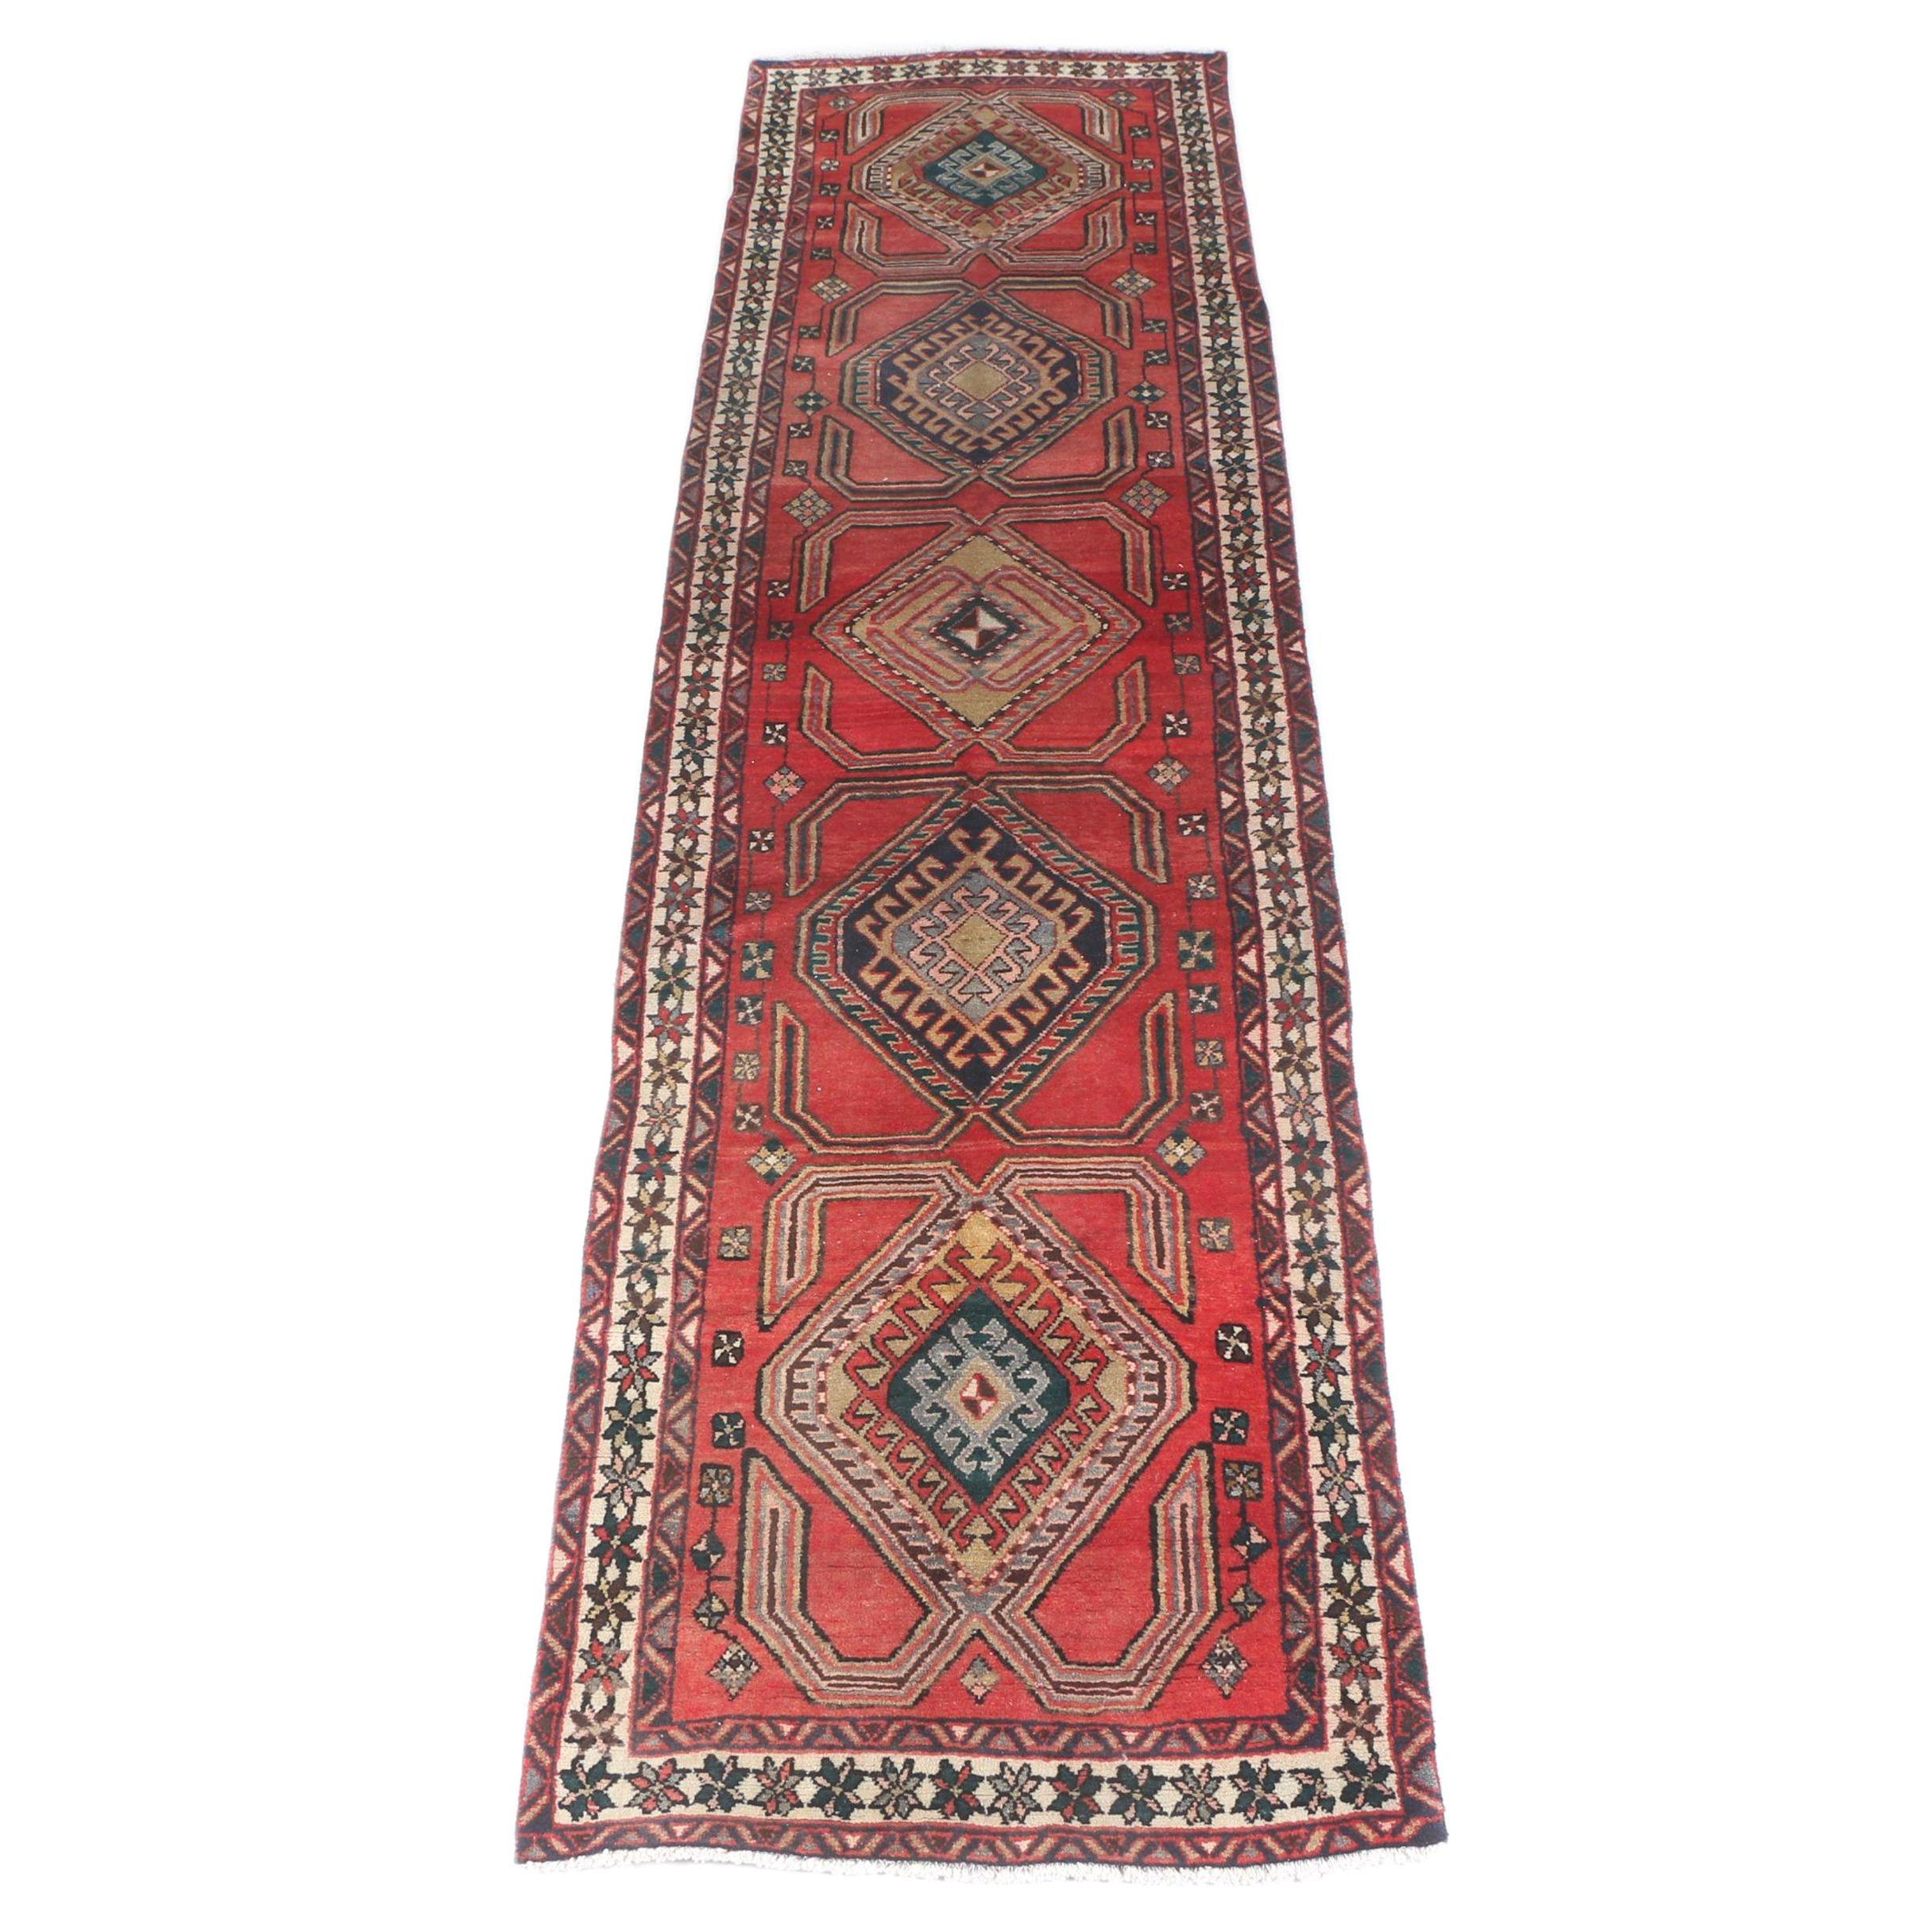 Hand-Knotted Caucasian Kazak Carpet Runner